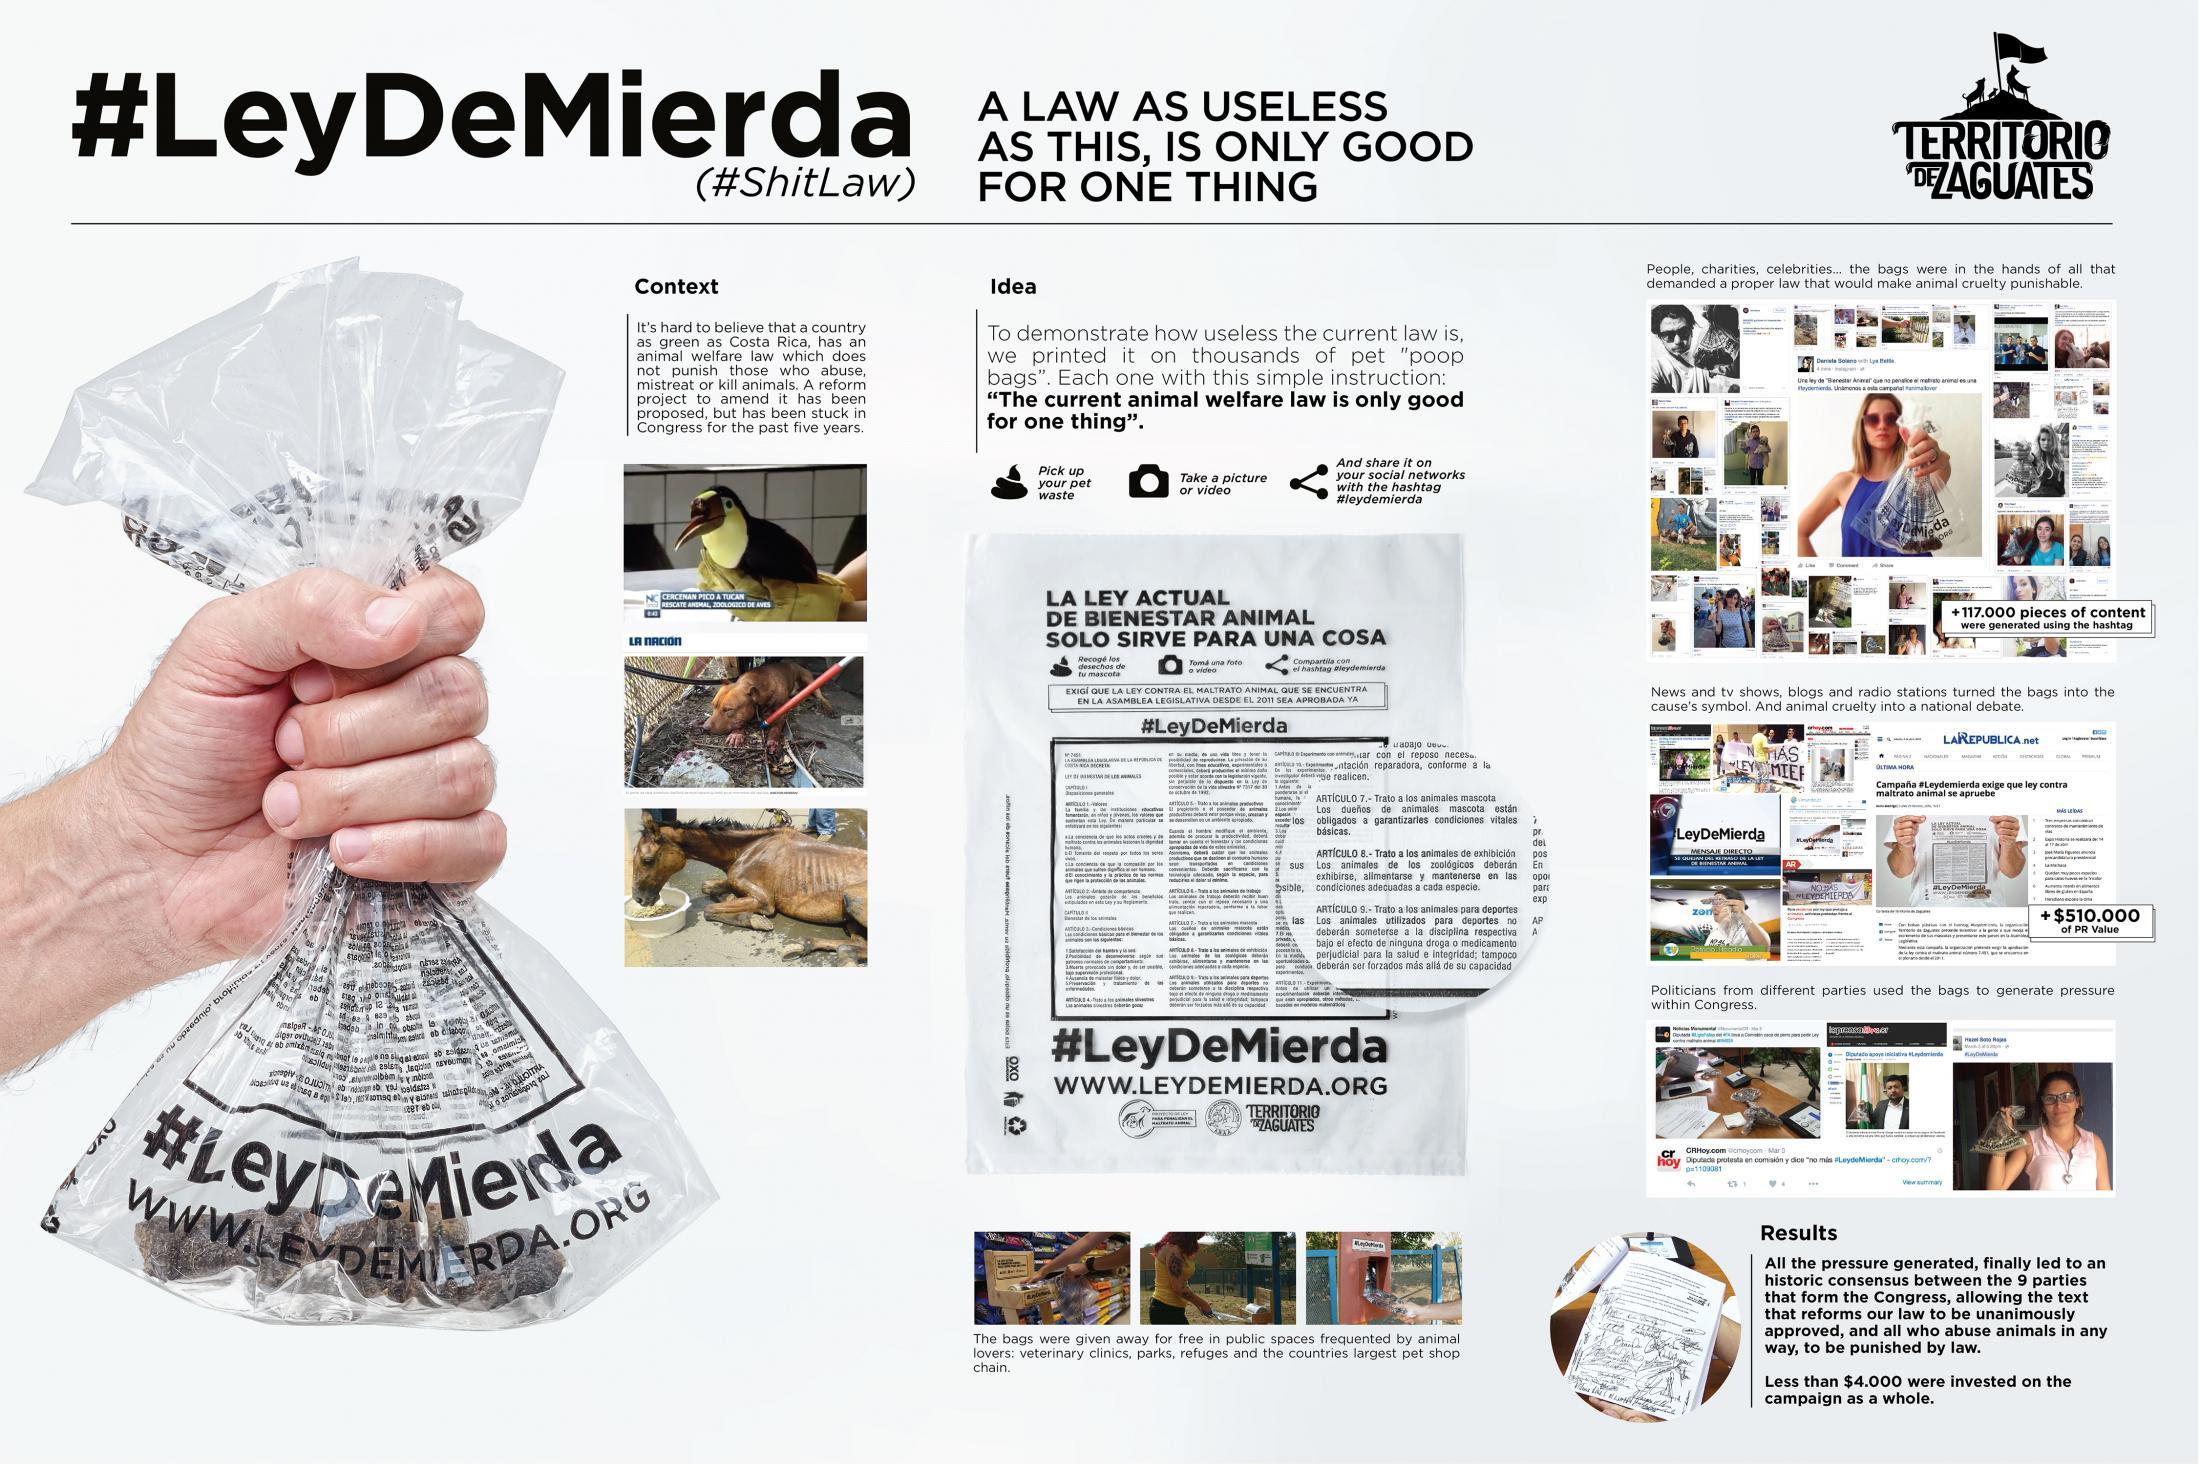 Thumbnail for #LeyDeMierda (#ShitLaw)